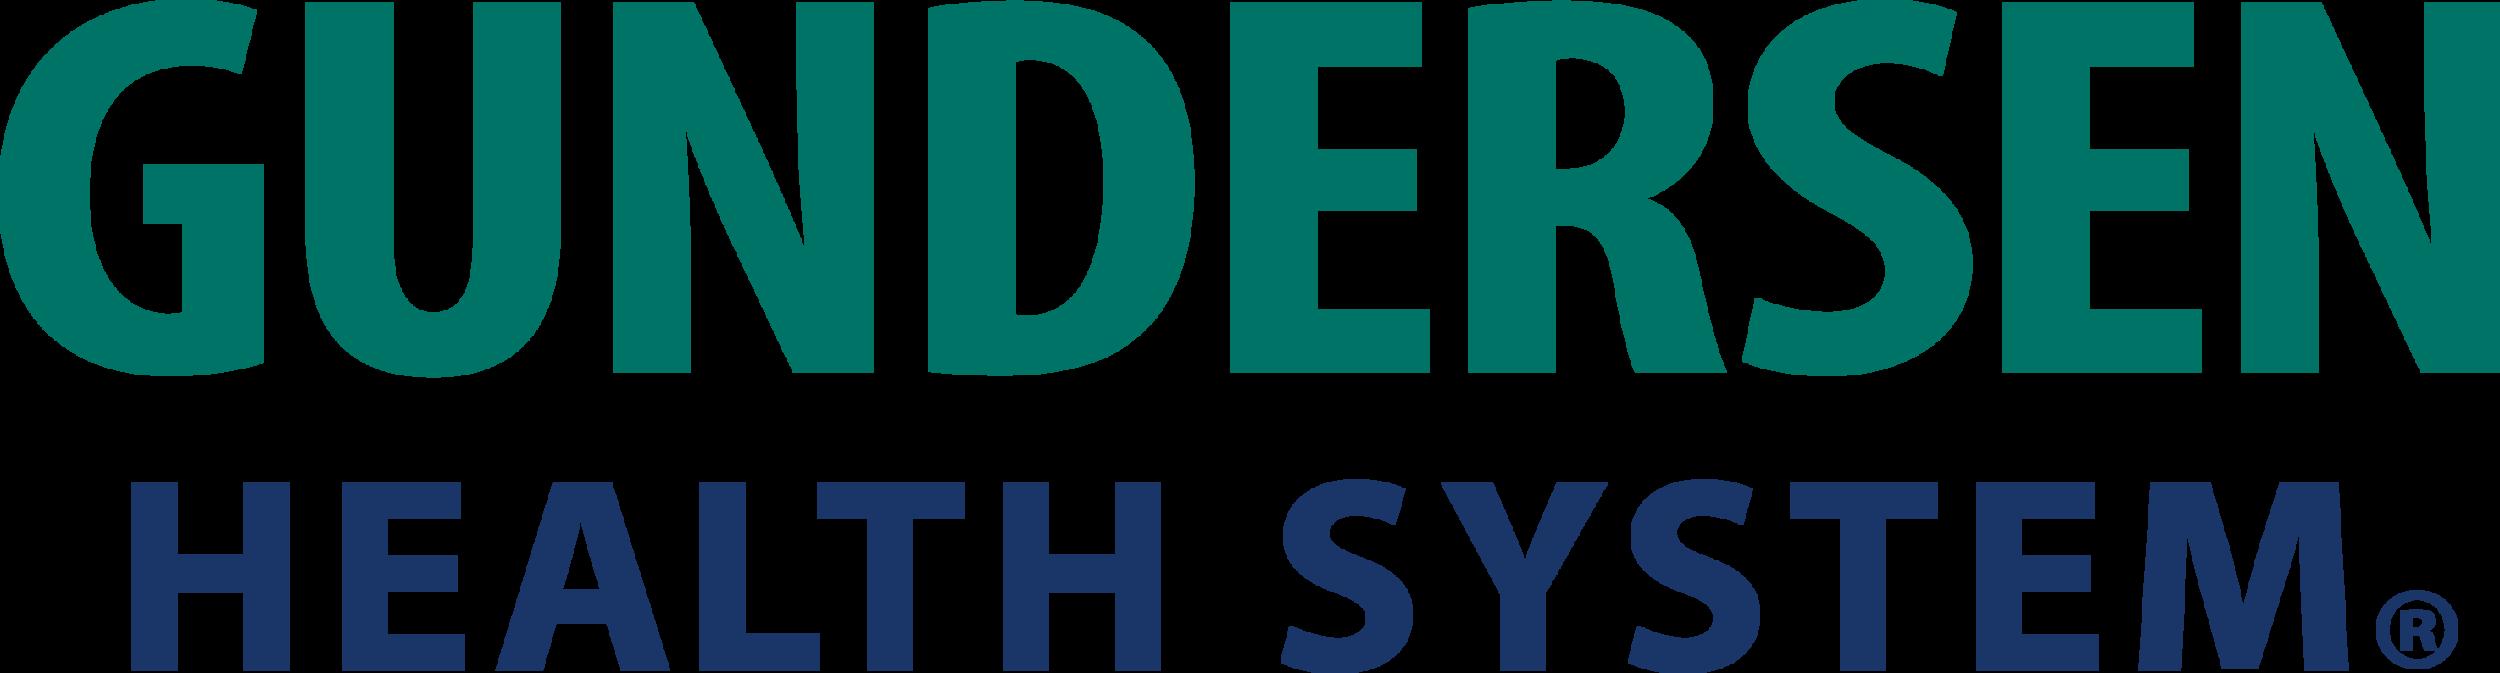 Gundersen-Health-System.png